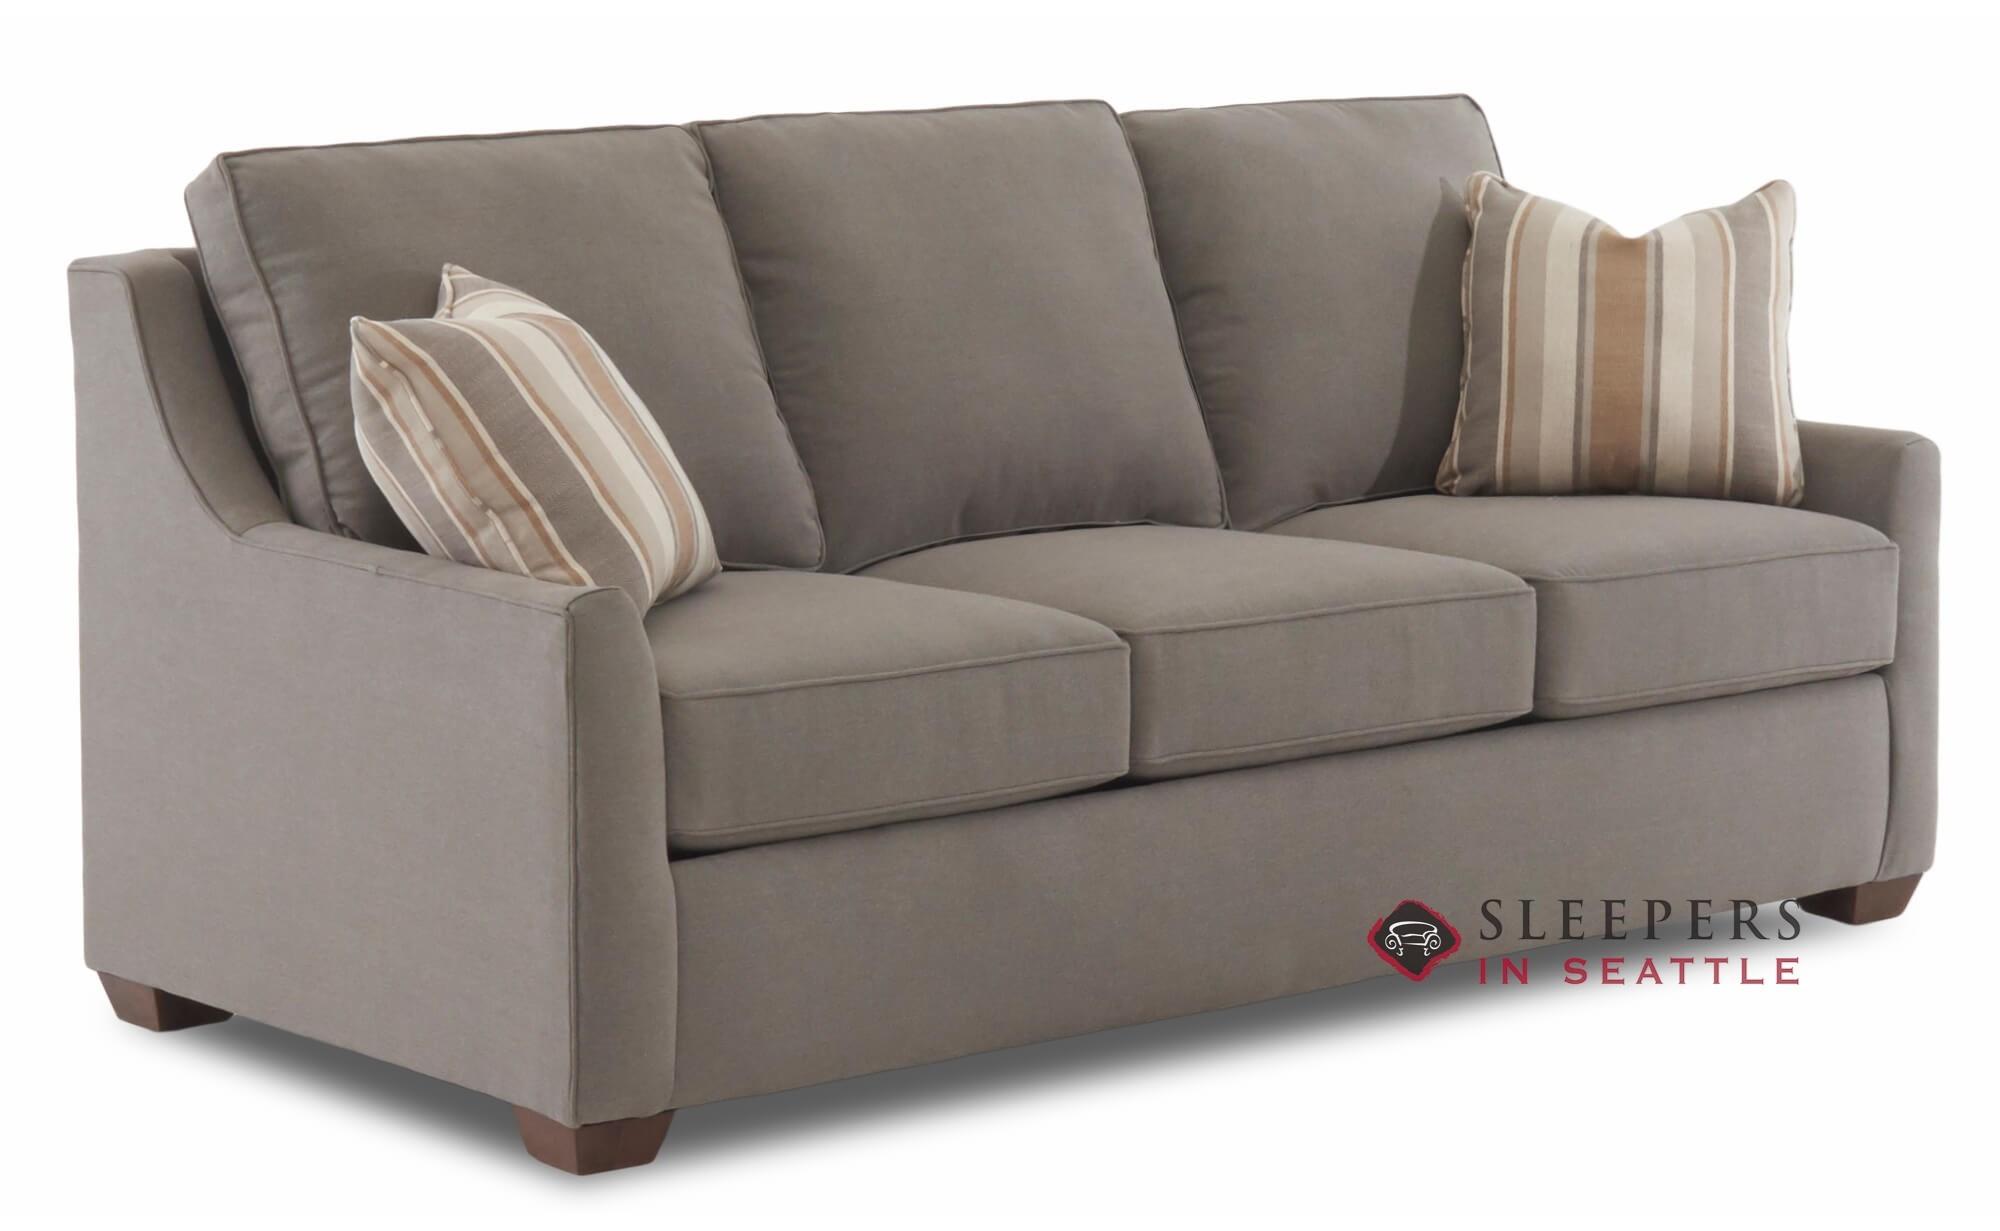 Enjoyable Savvy Fairfield Queen Sleeper Sofa Theyellowbook Wood Chair Design Ideas Theyellowbookinfo